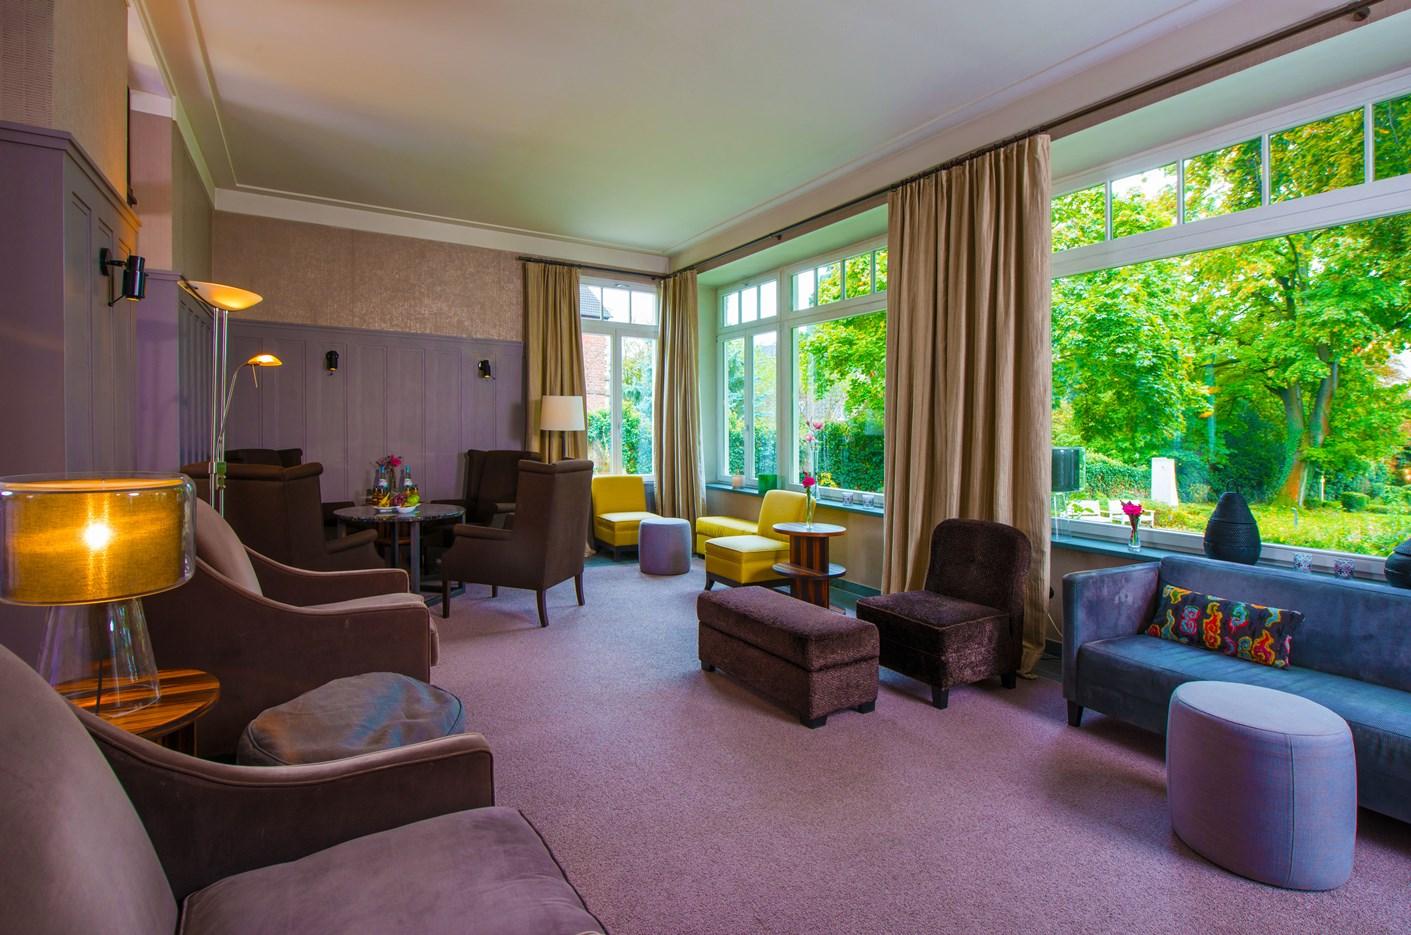 Villa Leonhart Eventlocation Wintergarten Lounge Villa